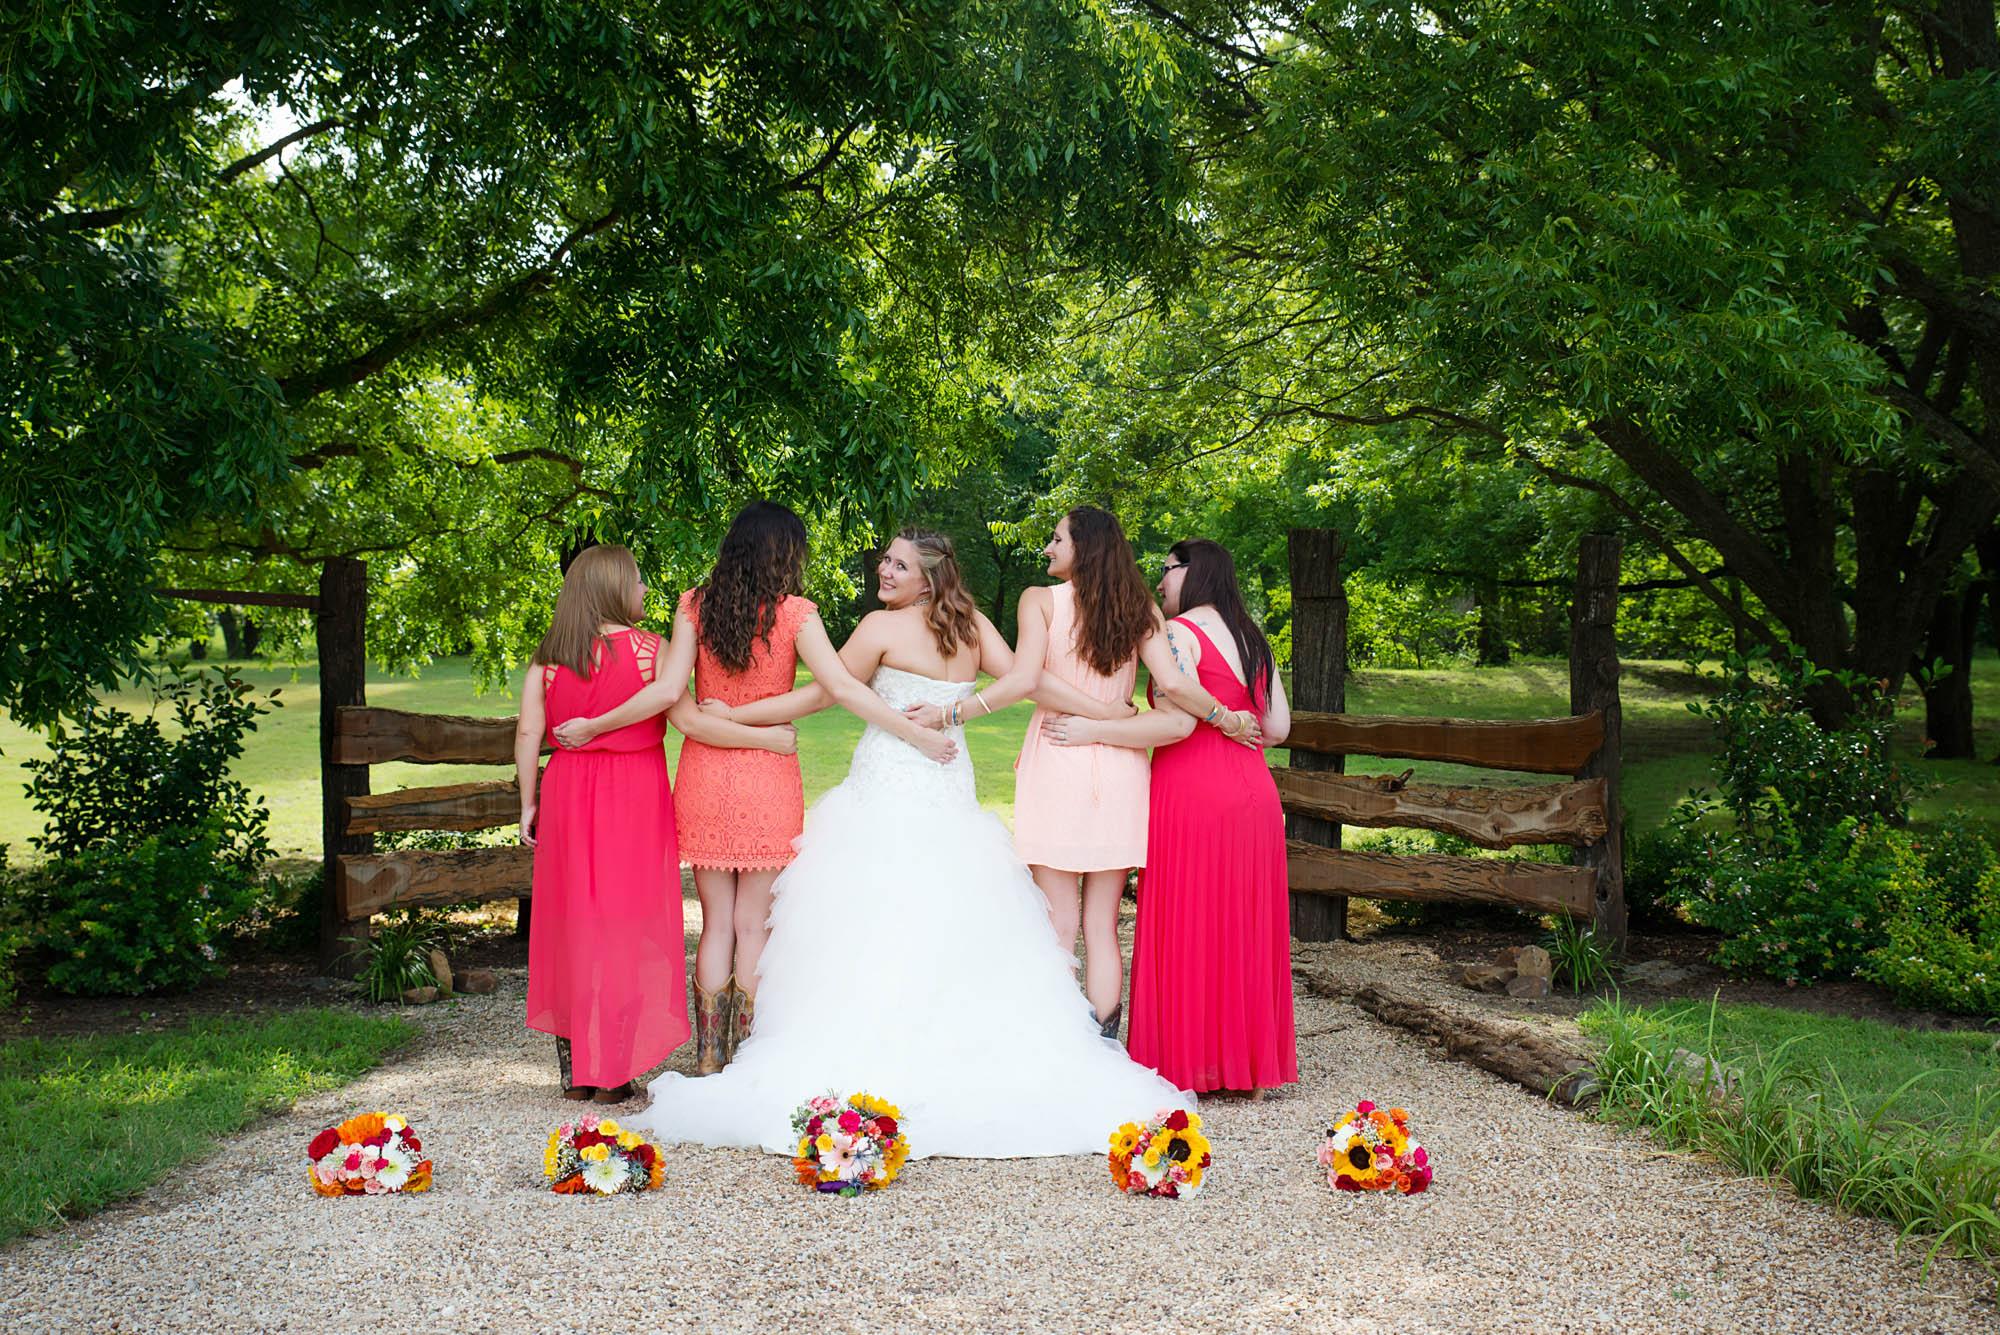 Stephanie Ray Wedding PhotographyDSC_4023w.jpg